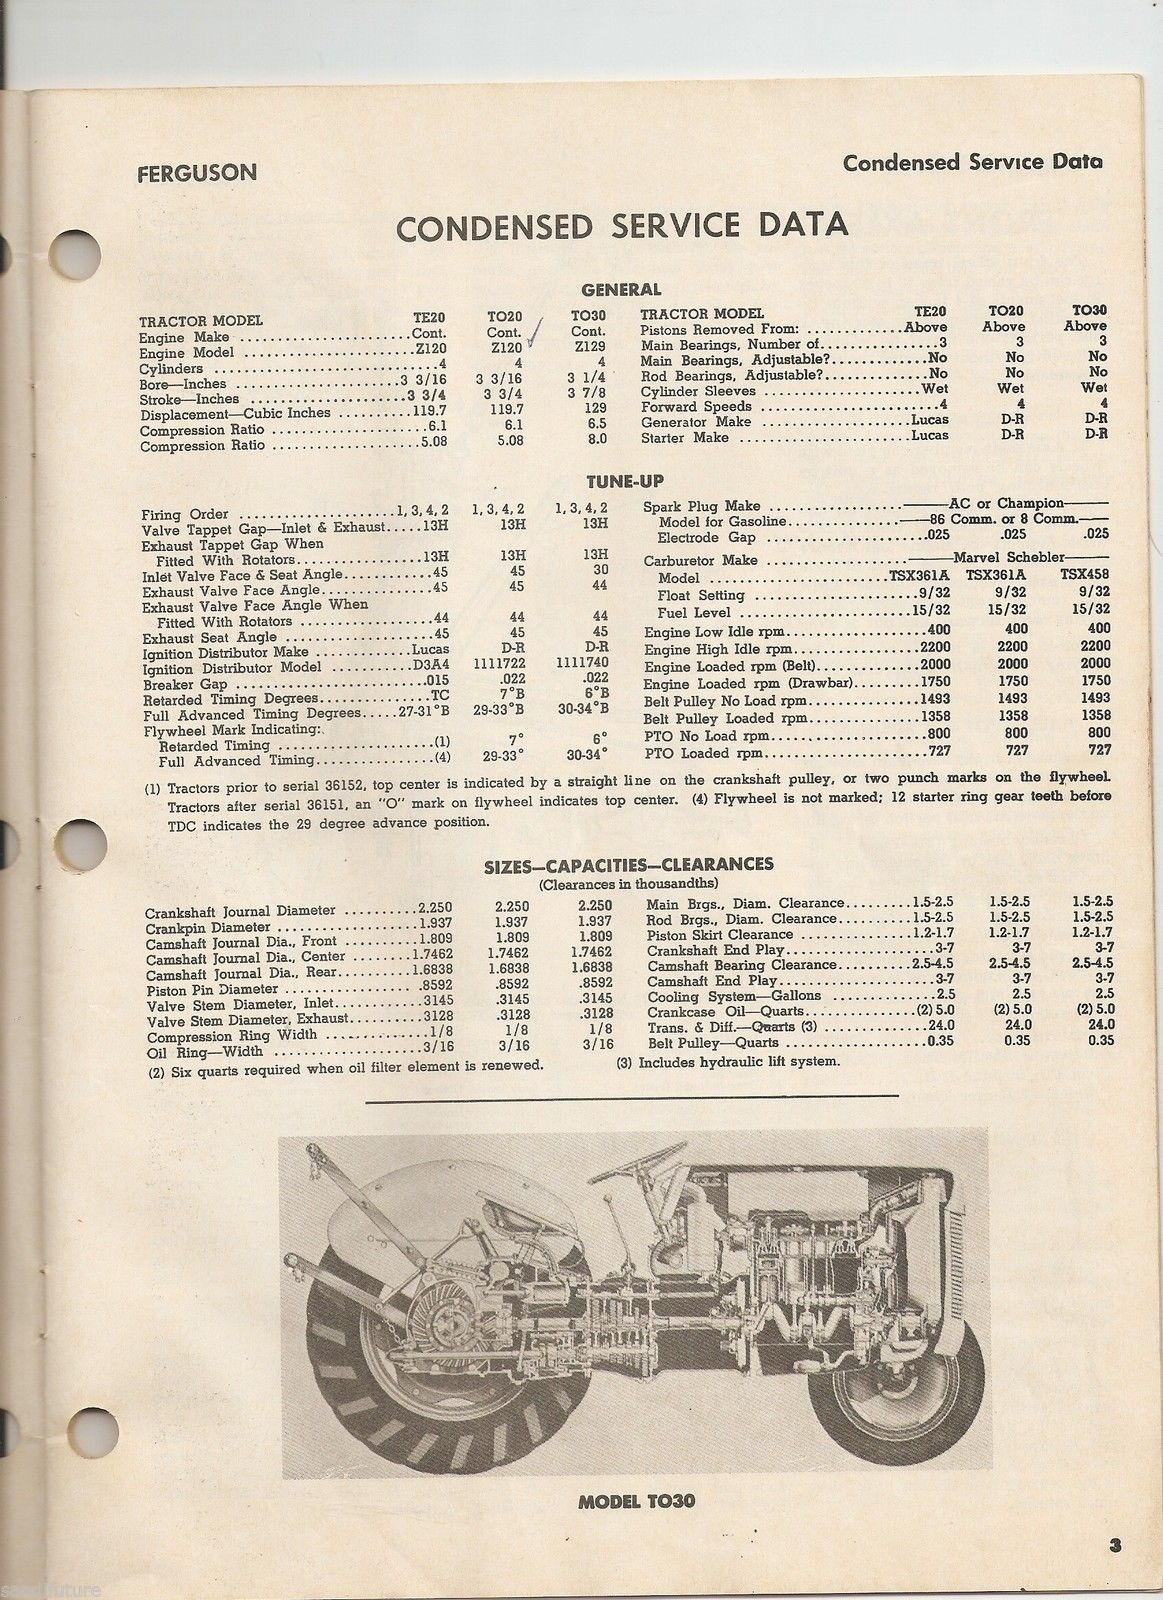 1953 53 Ferguson I&T I & T tractor shop manual FE-2 models TE20 TO20 TO30